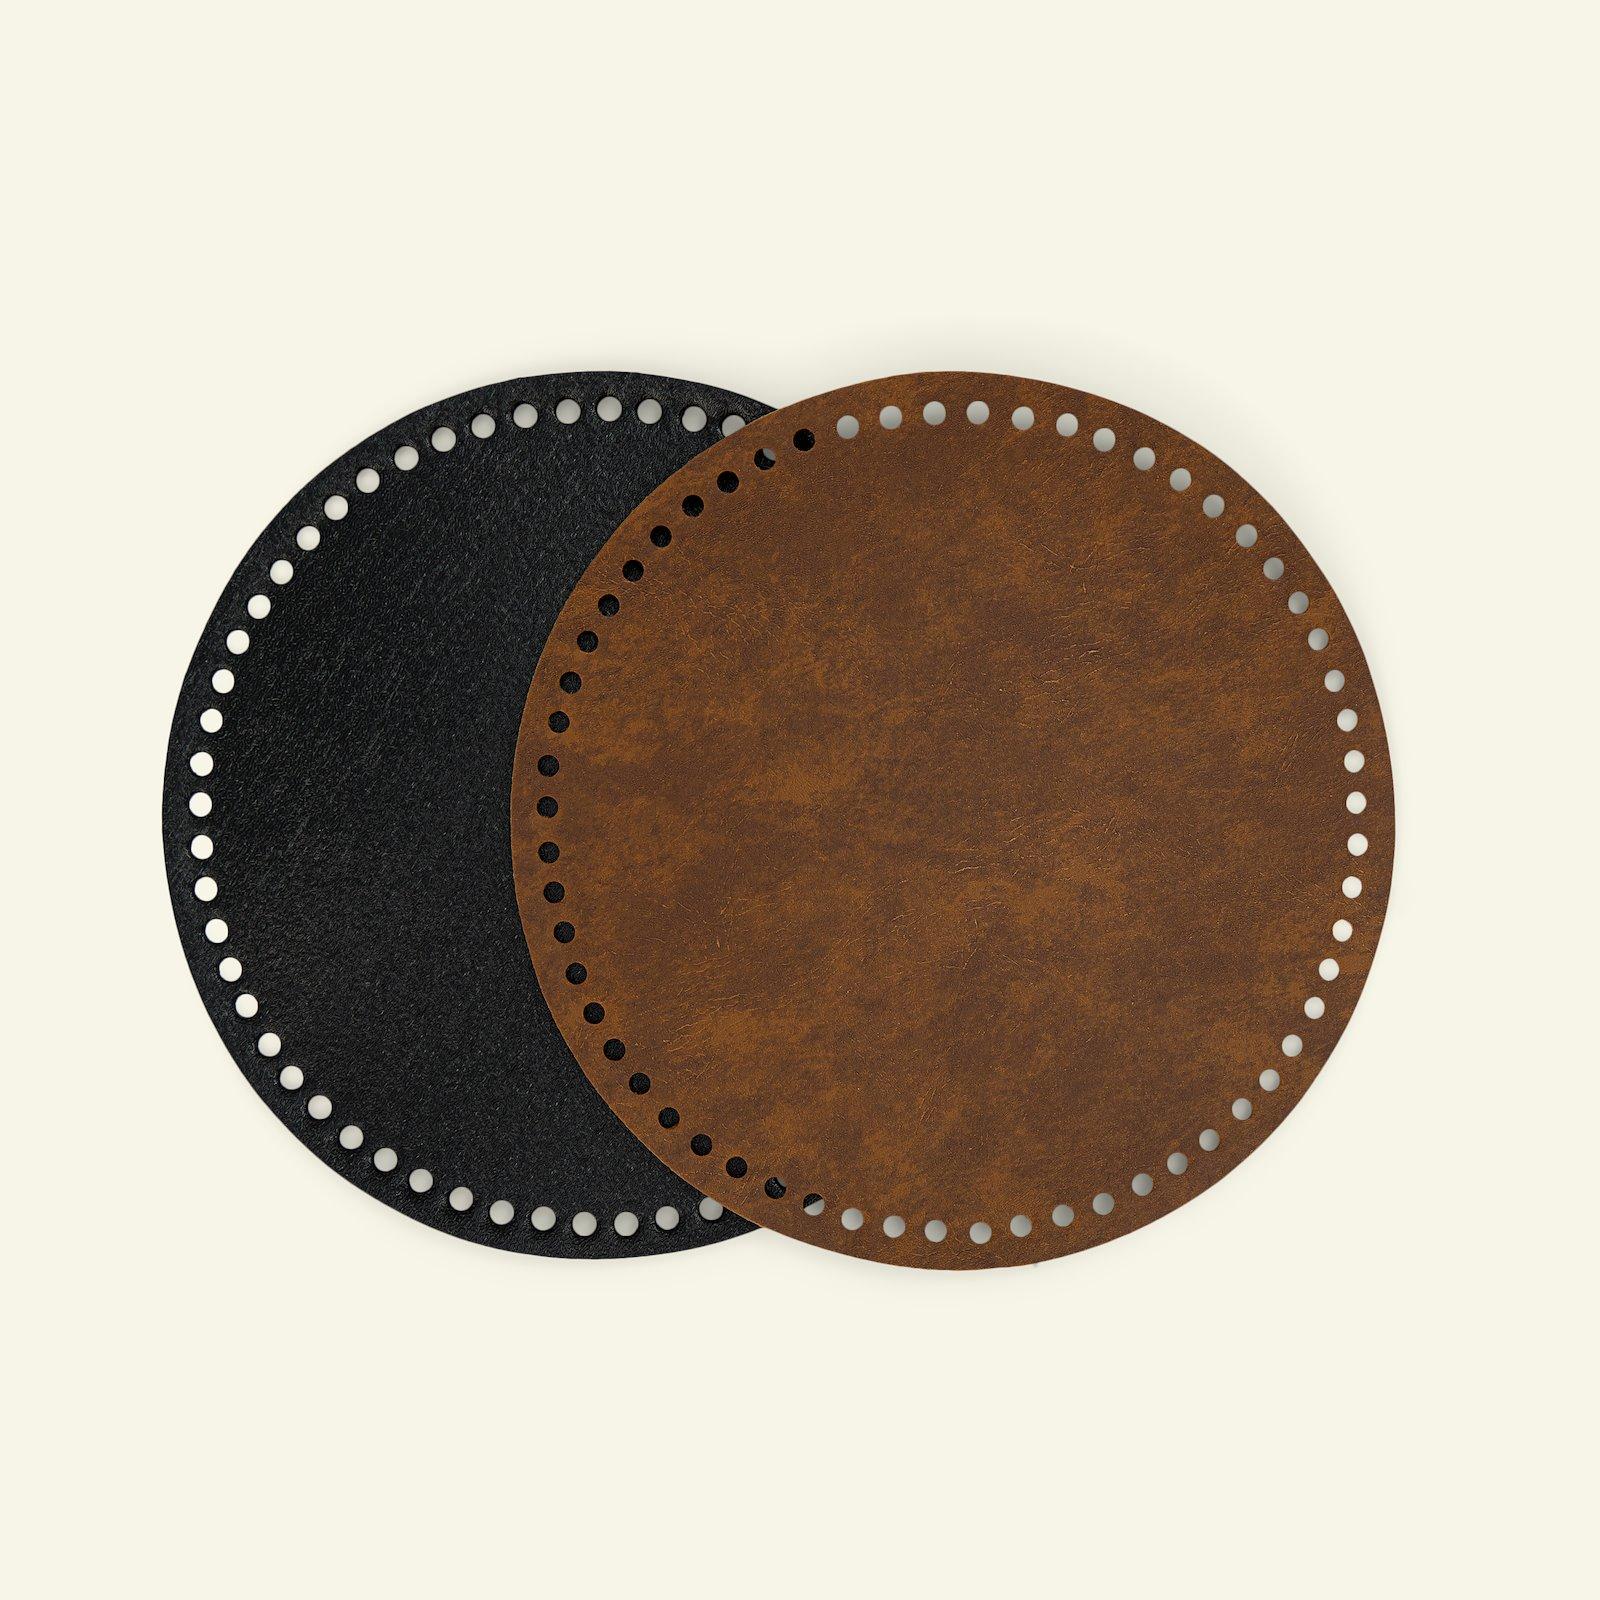 FRAYA bag/basket bottom 20cm brown 1pc 83310_pack